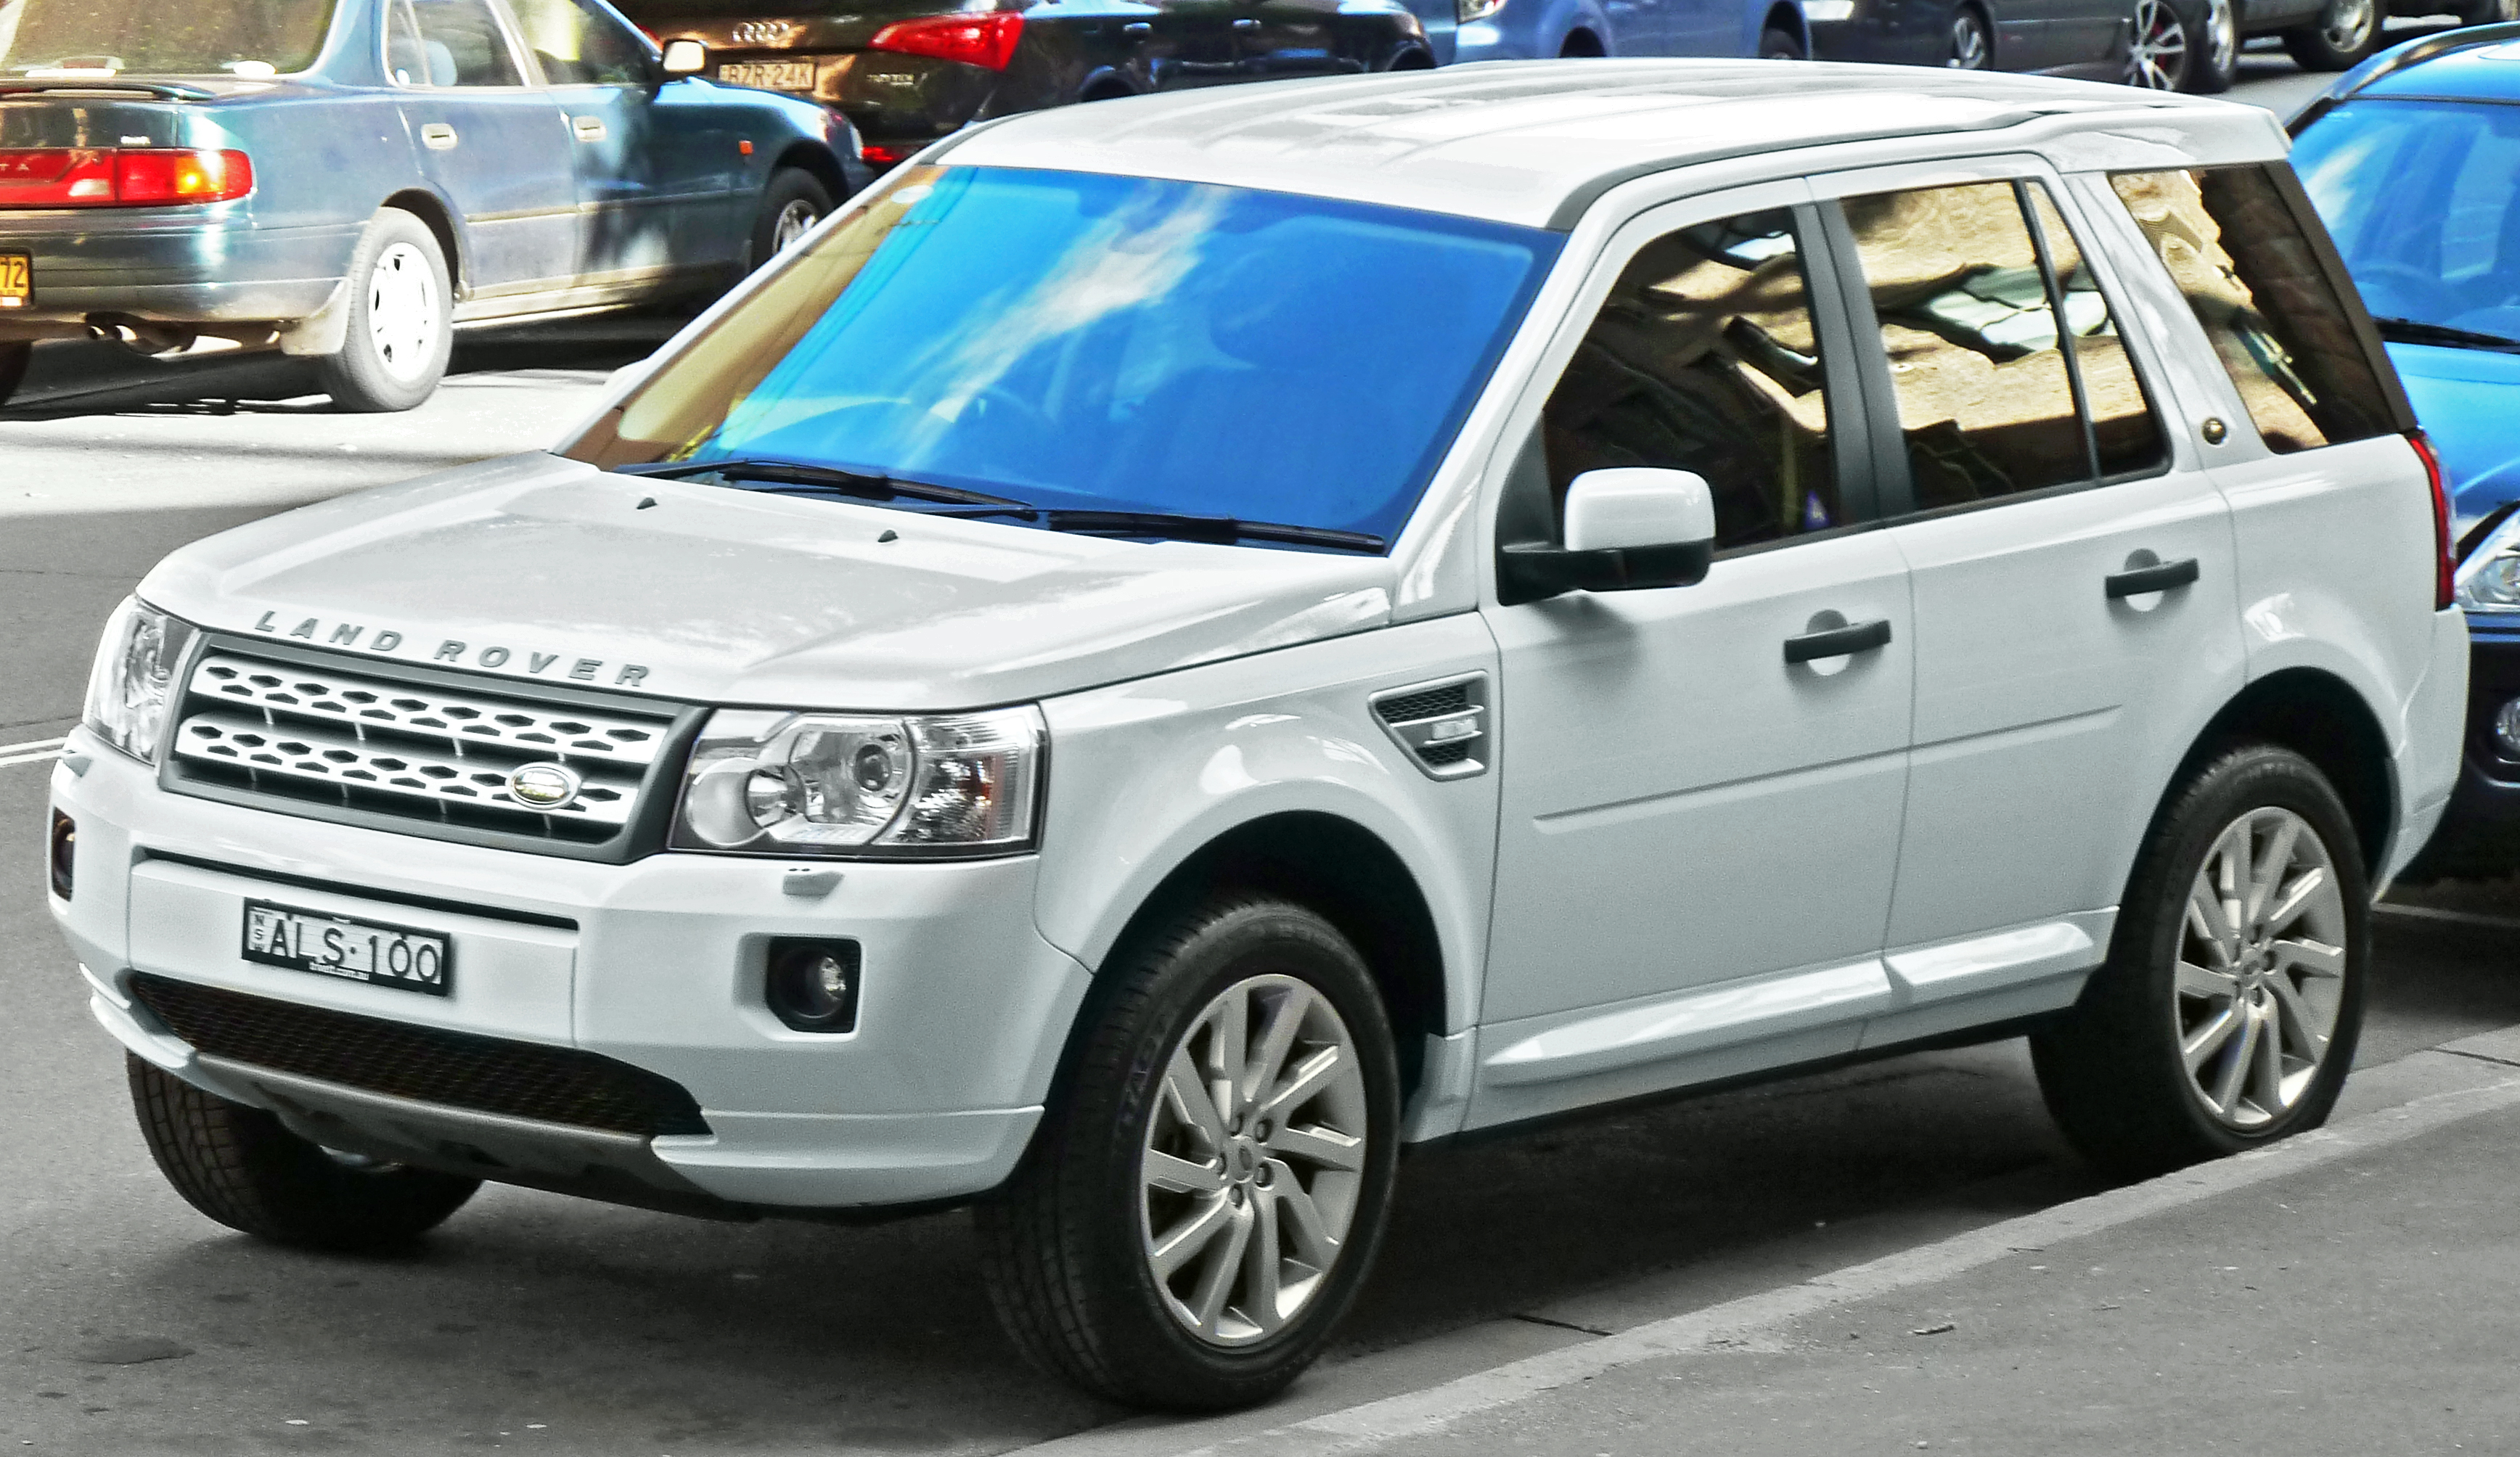 File 2010 2011 Land Rover Freelander 2 LF XS Si6 wagon 2011 10